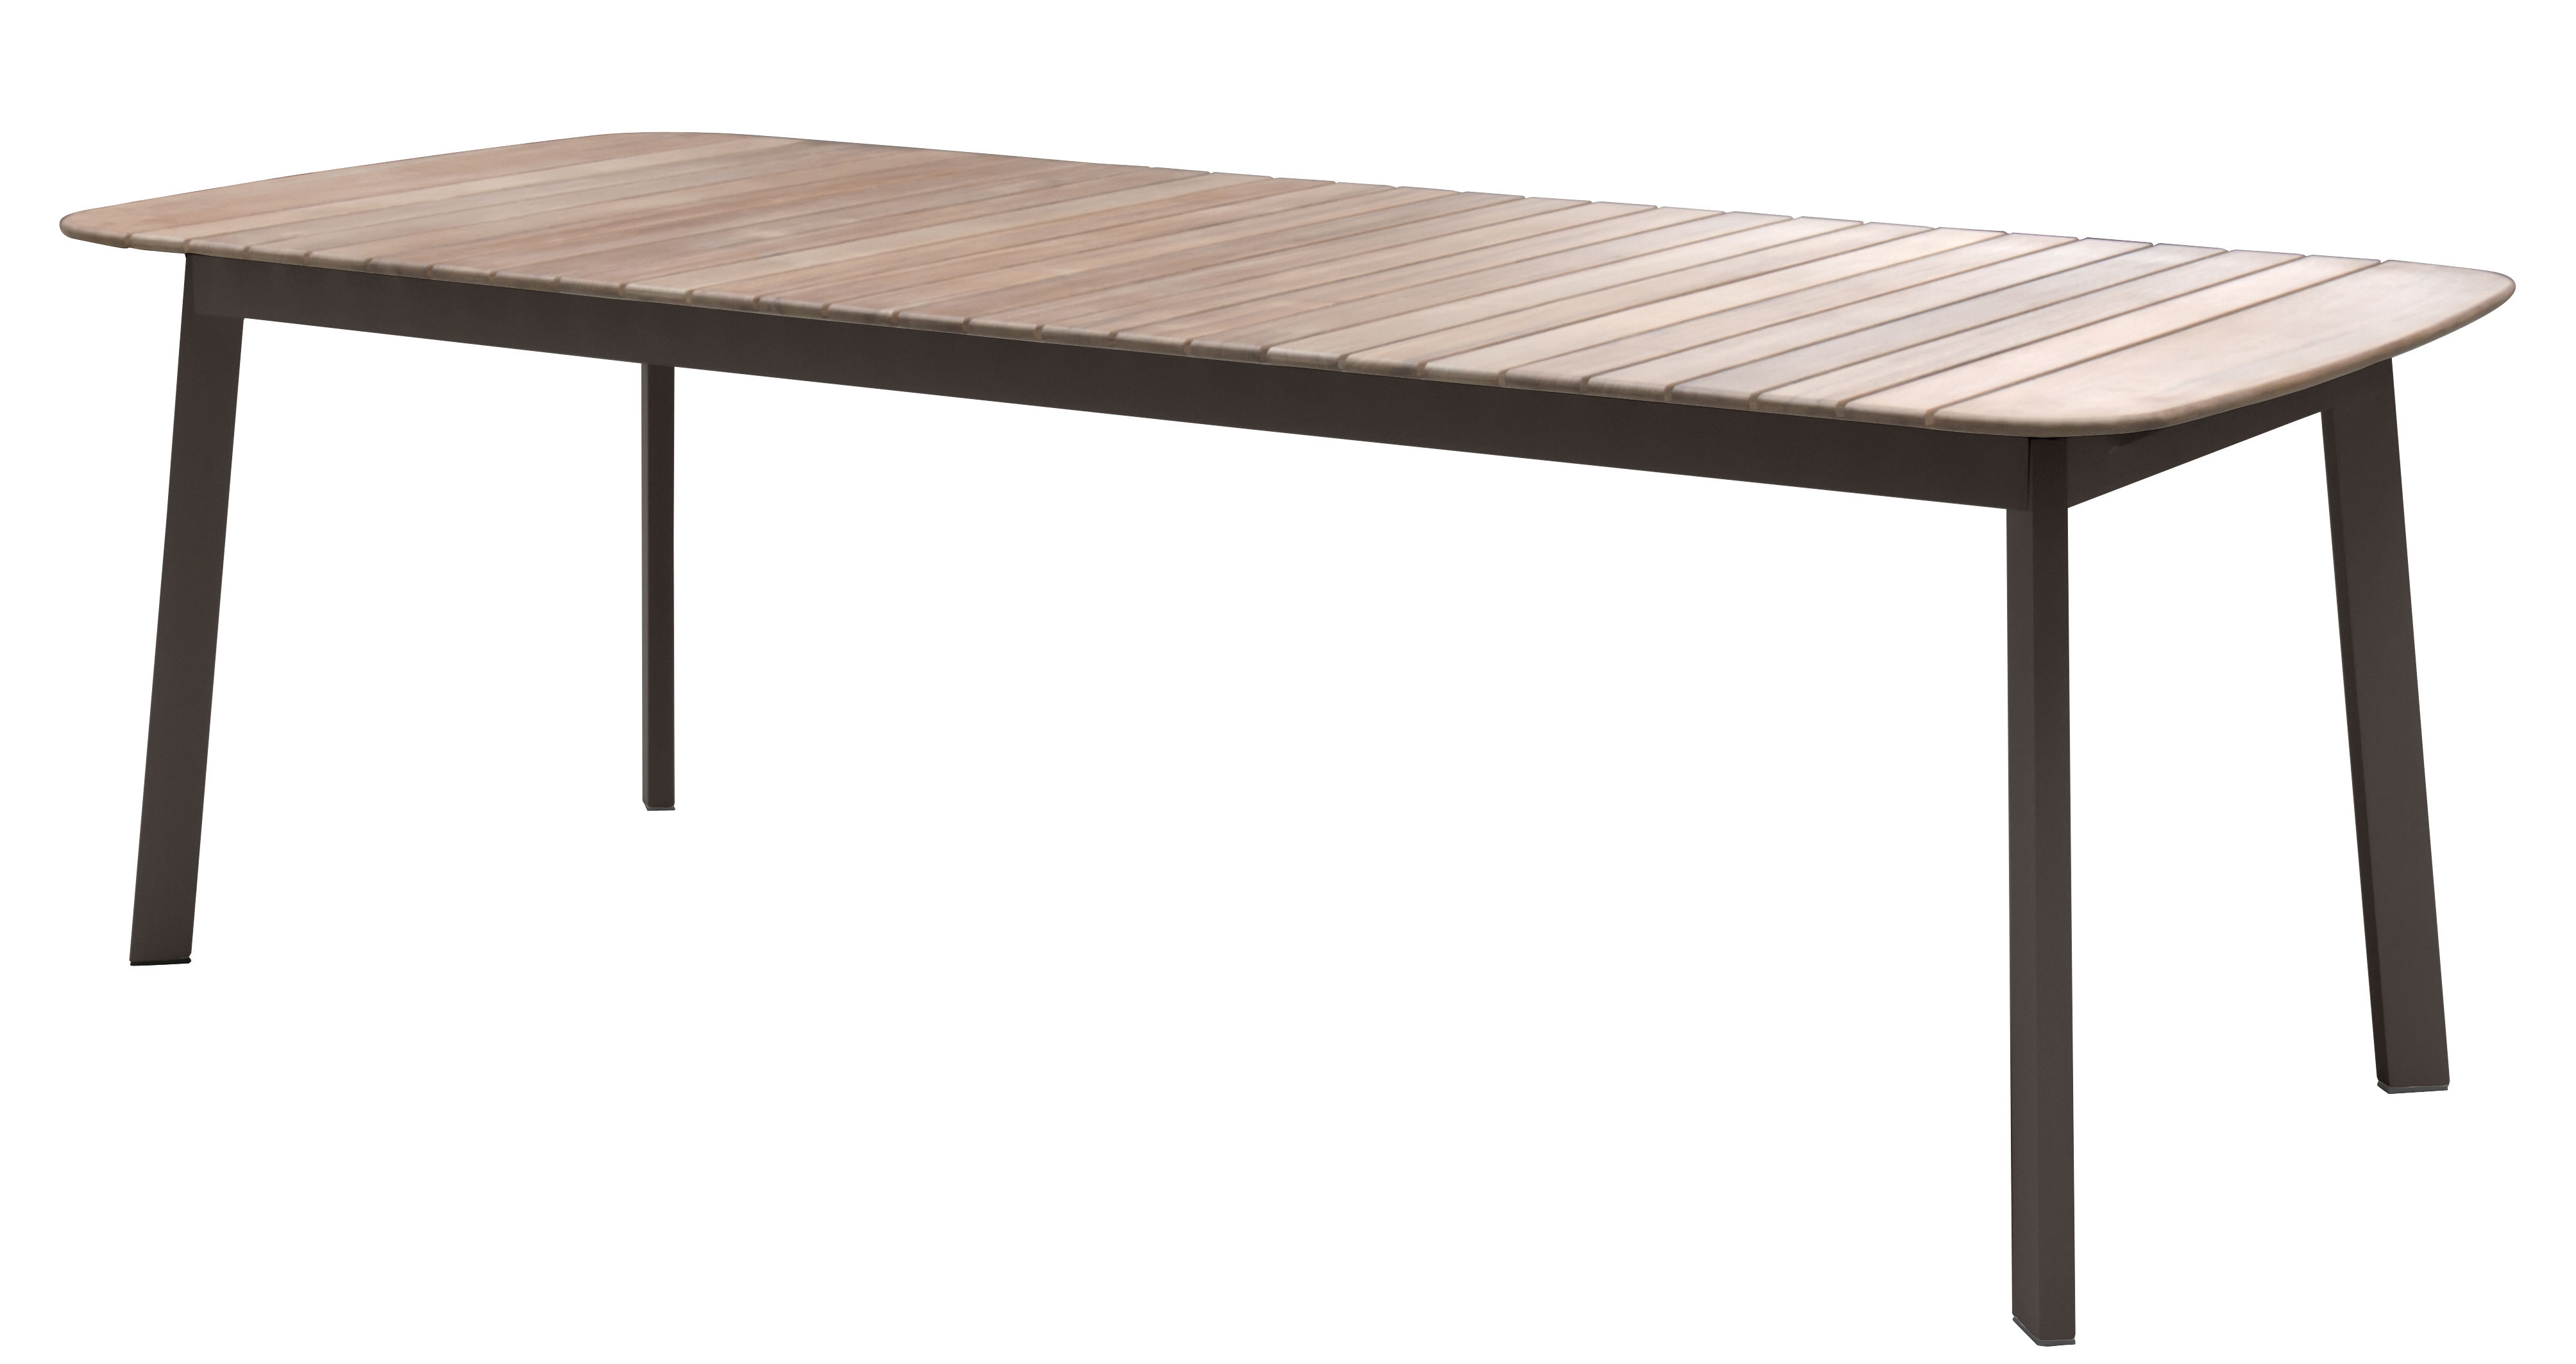 table shine plateau teck 225 x 100 cm marron d 39 inde plateau teck emu. Black Bedroom Furniture Sets. Home Design Ideas